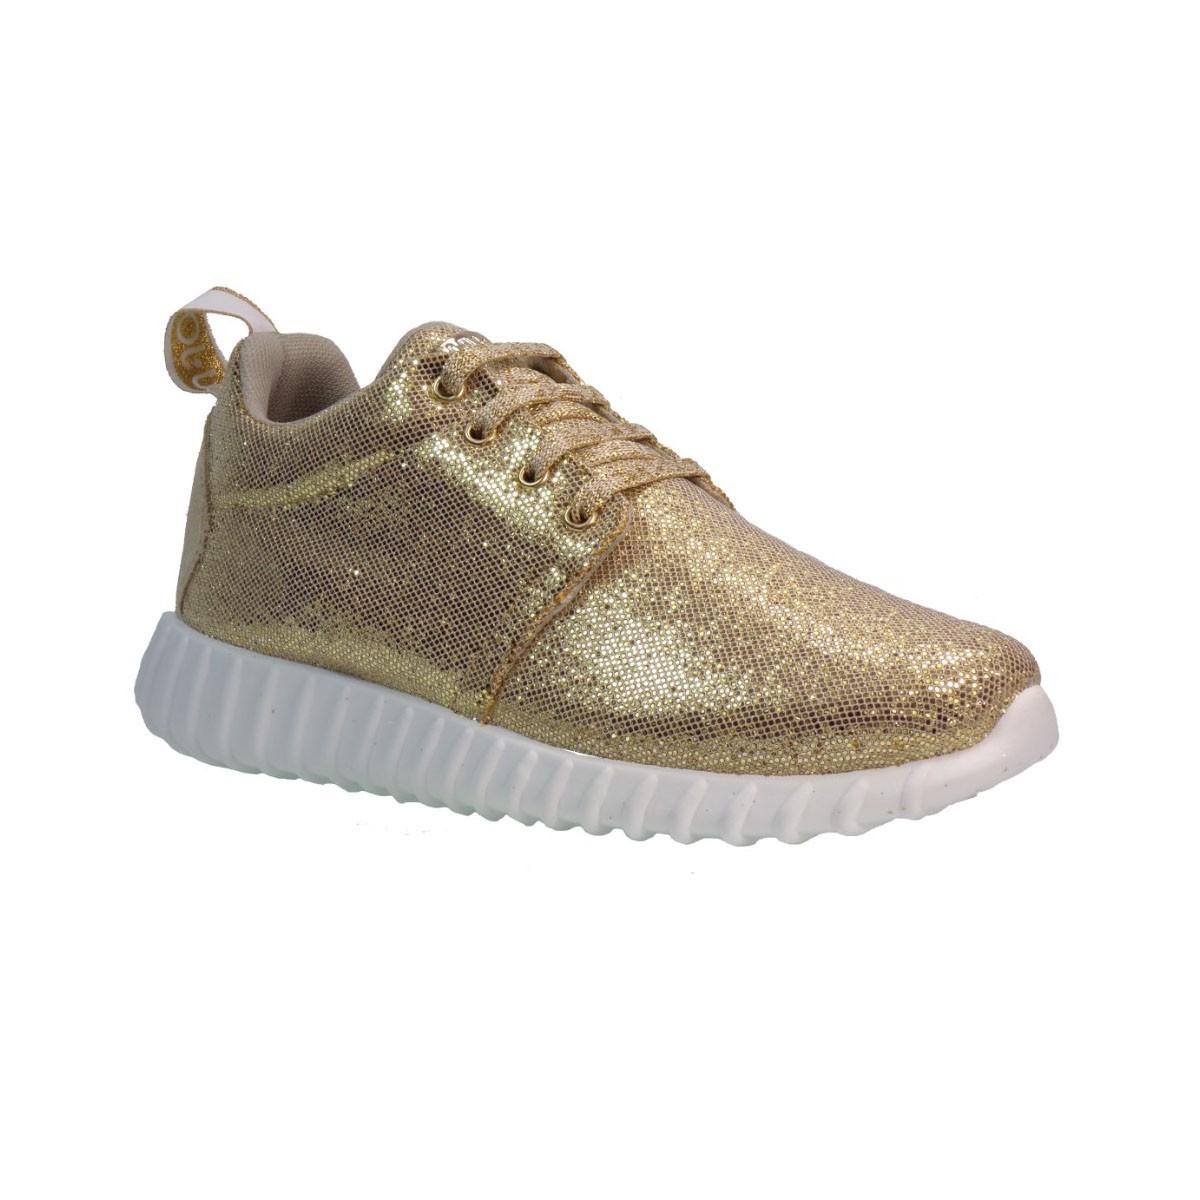 Liu-Jo Sneakers Παπούτσια Γυναικεία RUNNING SAORI Χρυσό Liu-Jo Running Saori Xryso